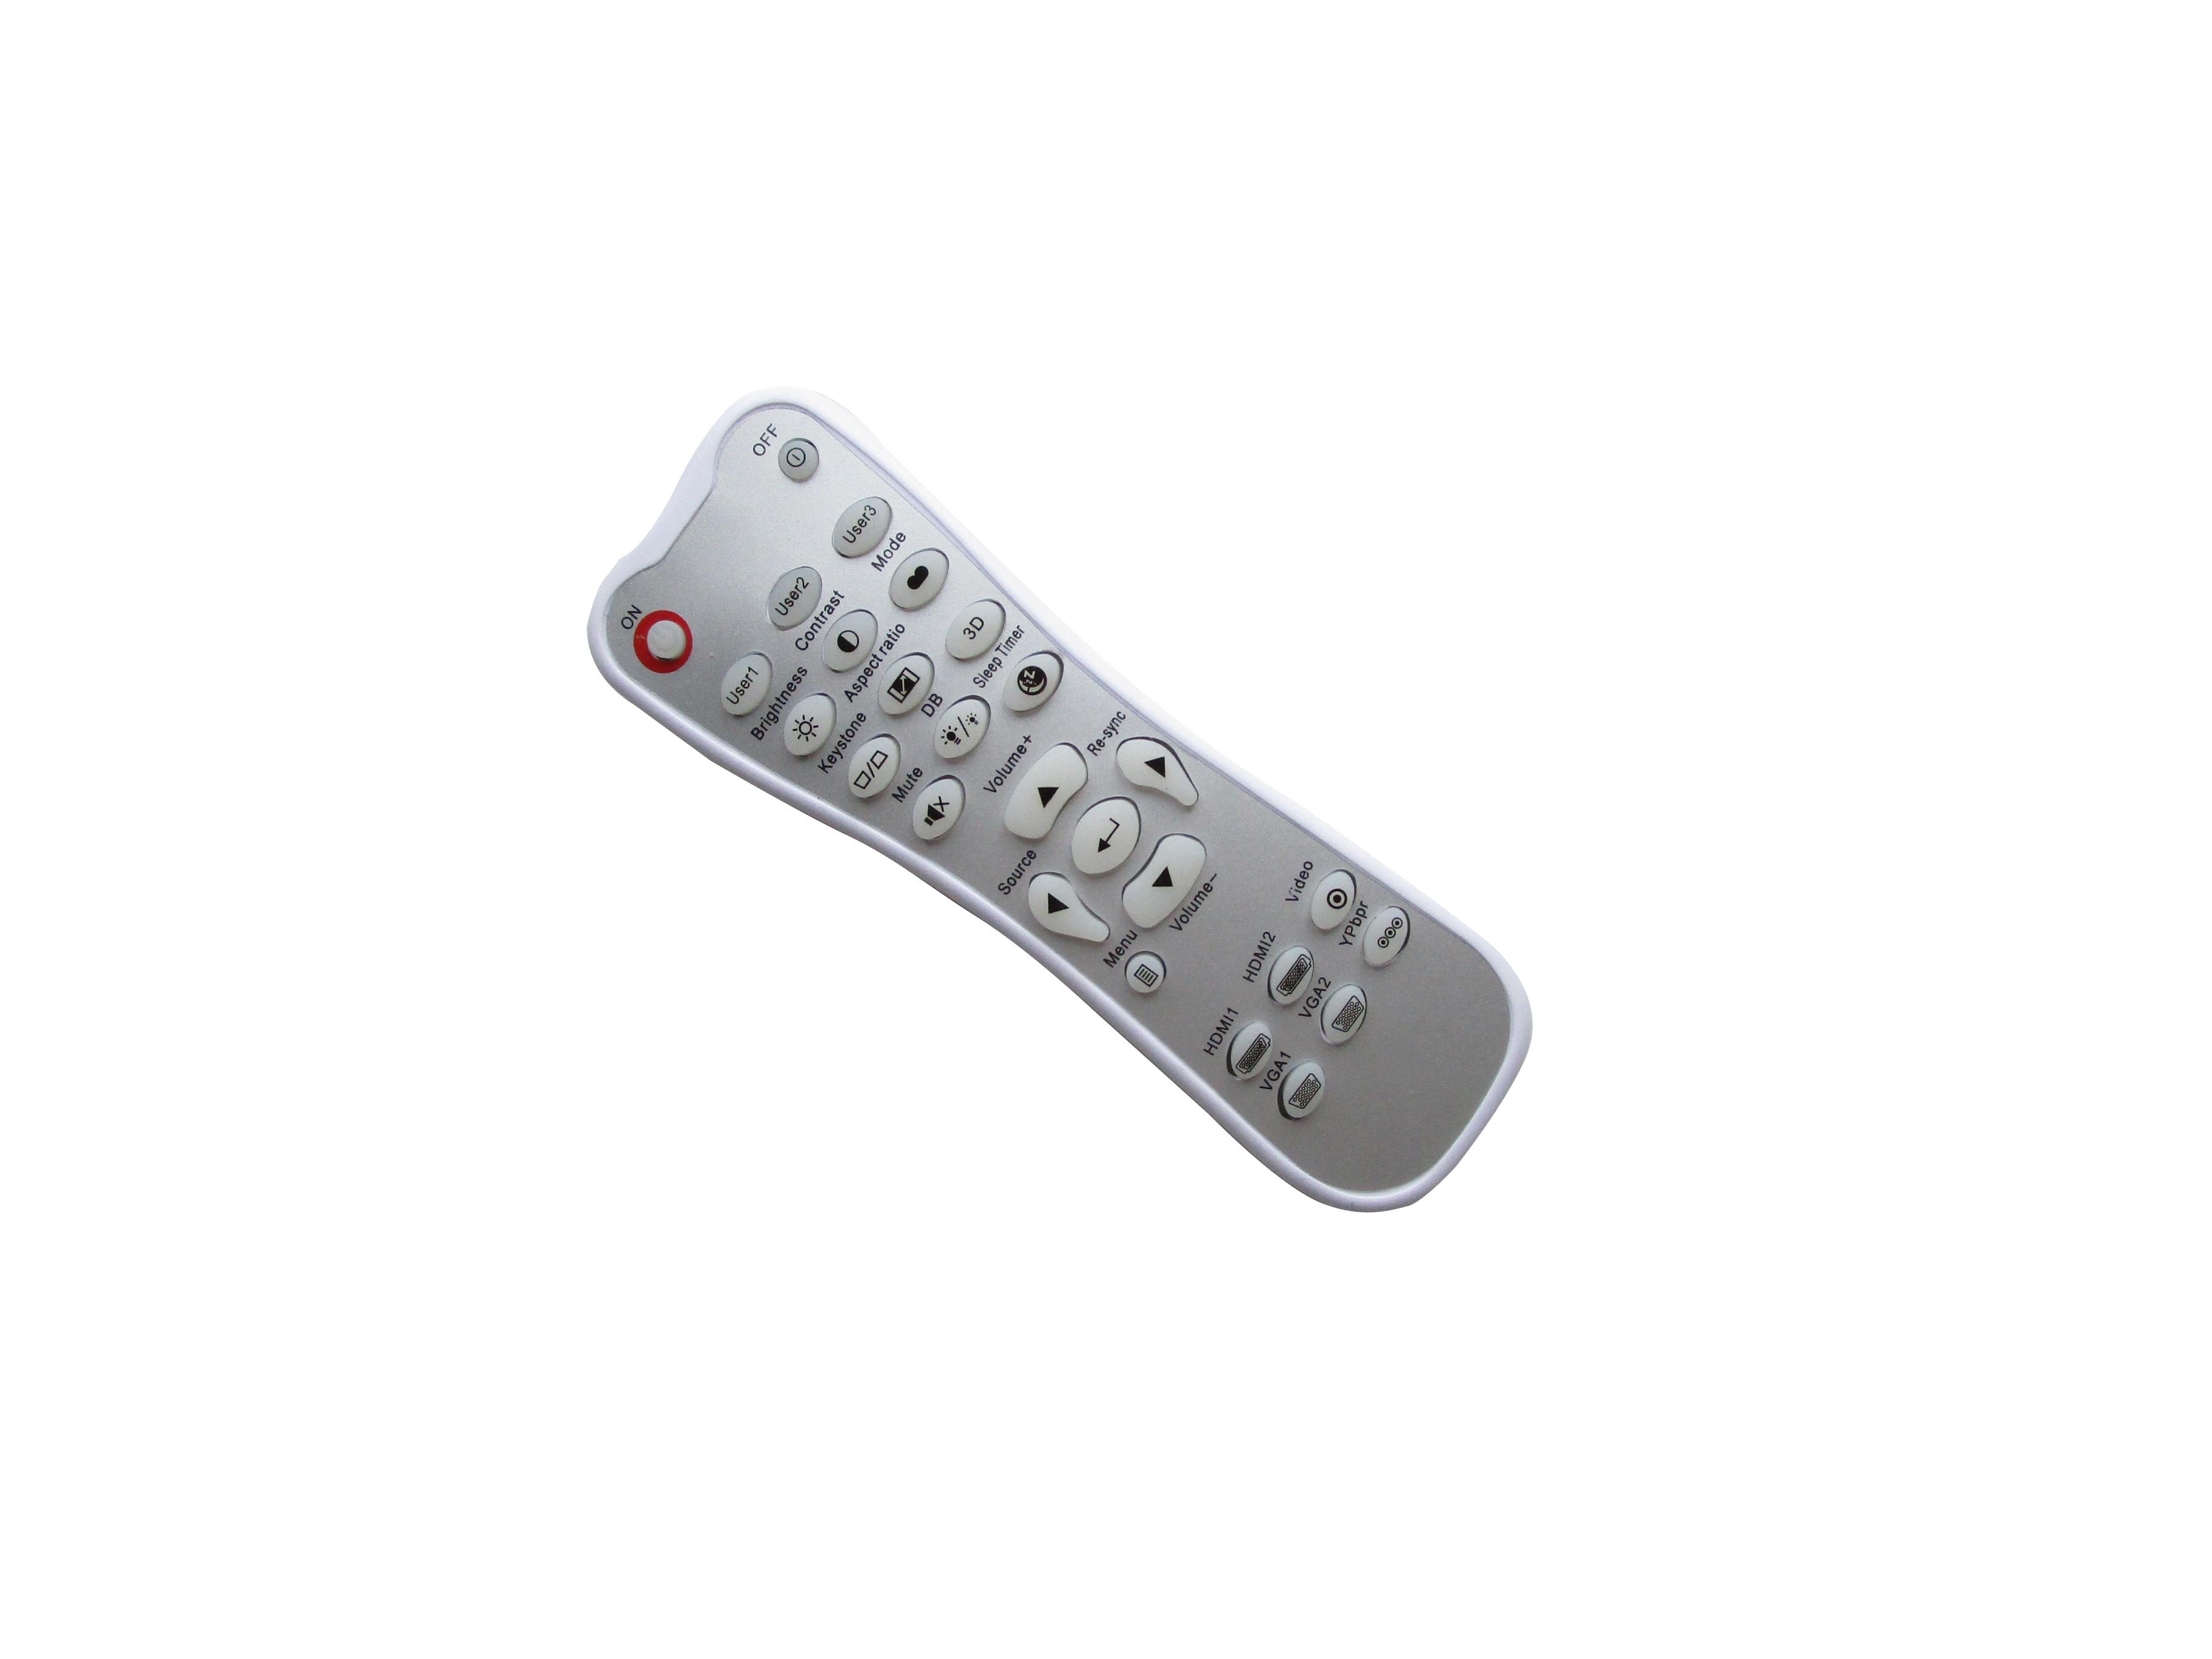 Control remoto para Optoma DH1009 DH1009I HD137X HD140X GT1080E GT1080Darbee HD240X HD26BI HD270 BR-3003B HD141X, proyector DLP.